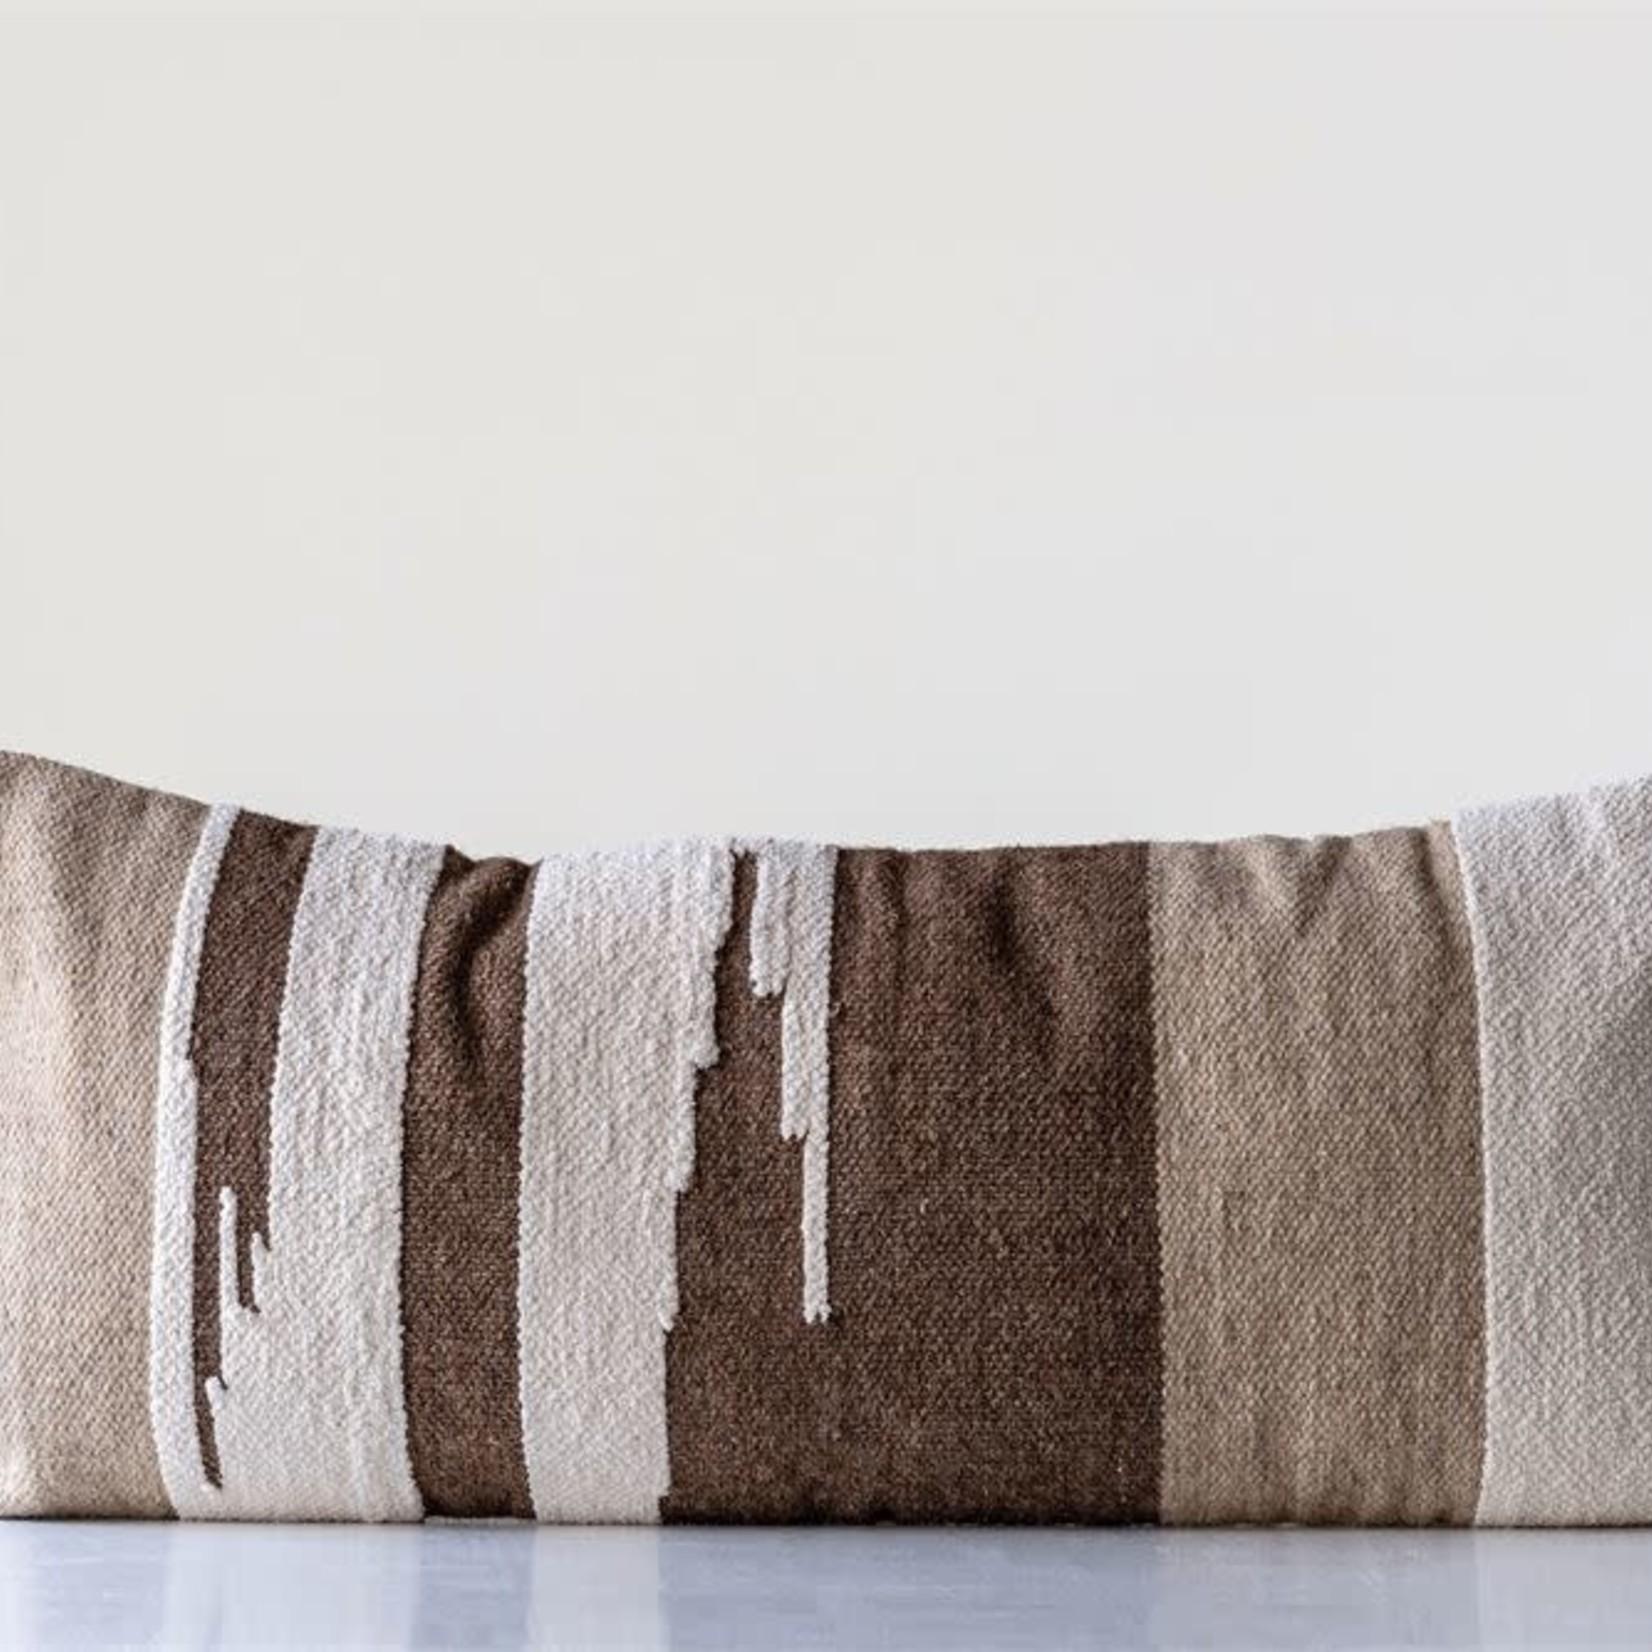 Hand Woven Wool Kilim Lumbar Pillow